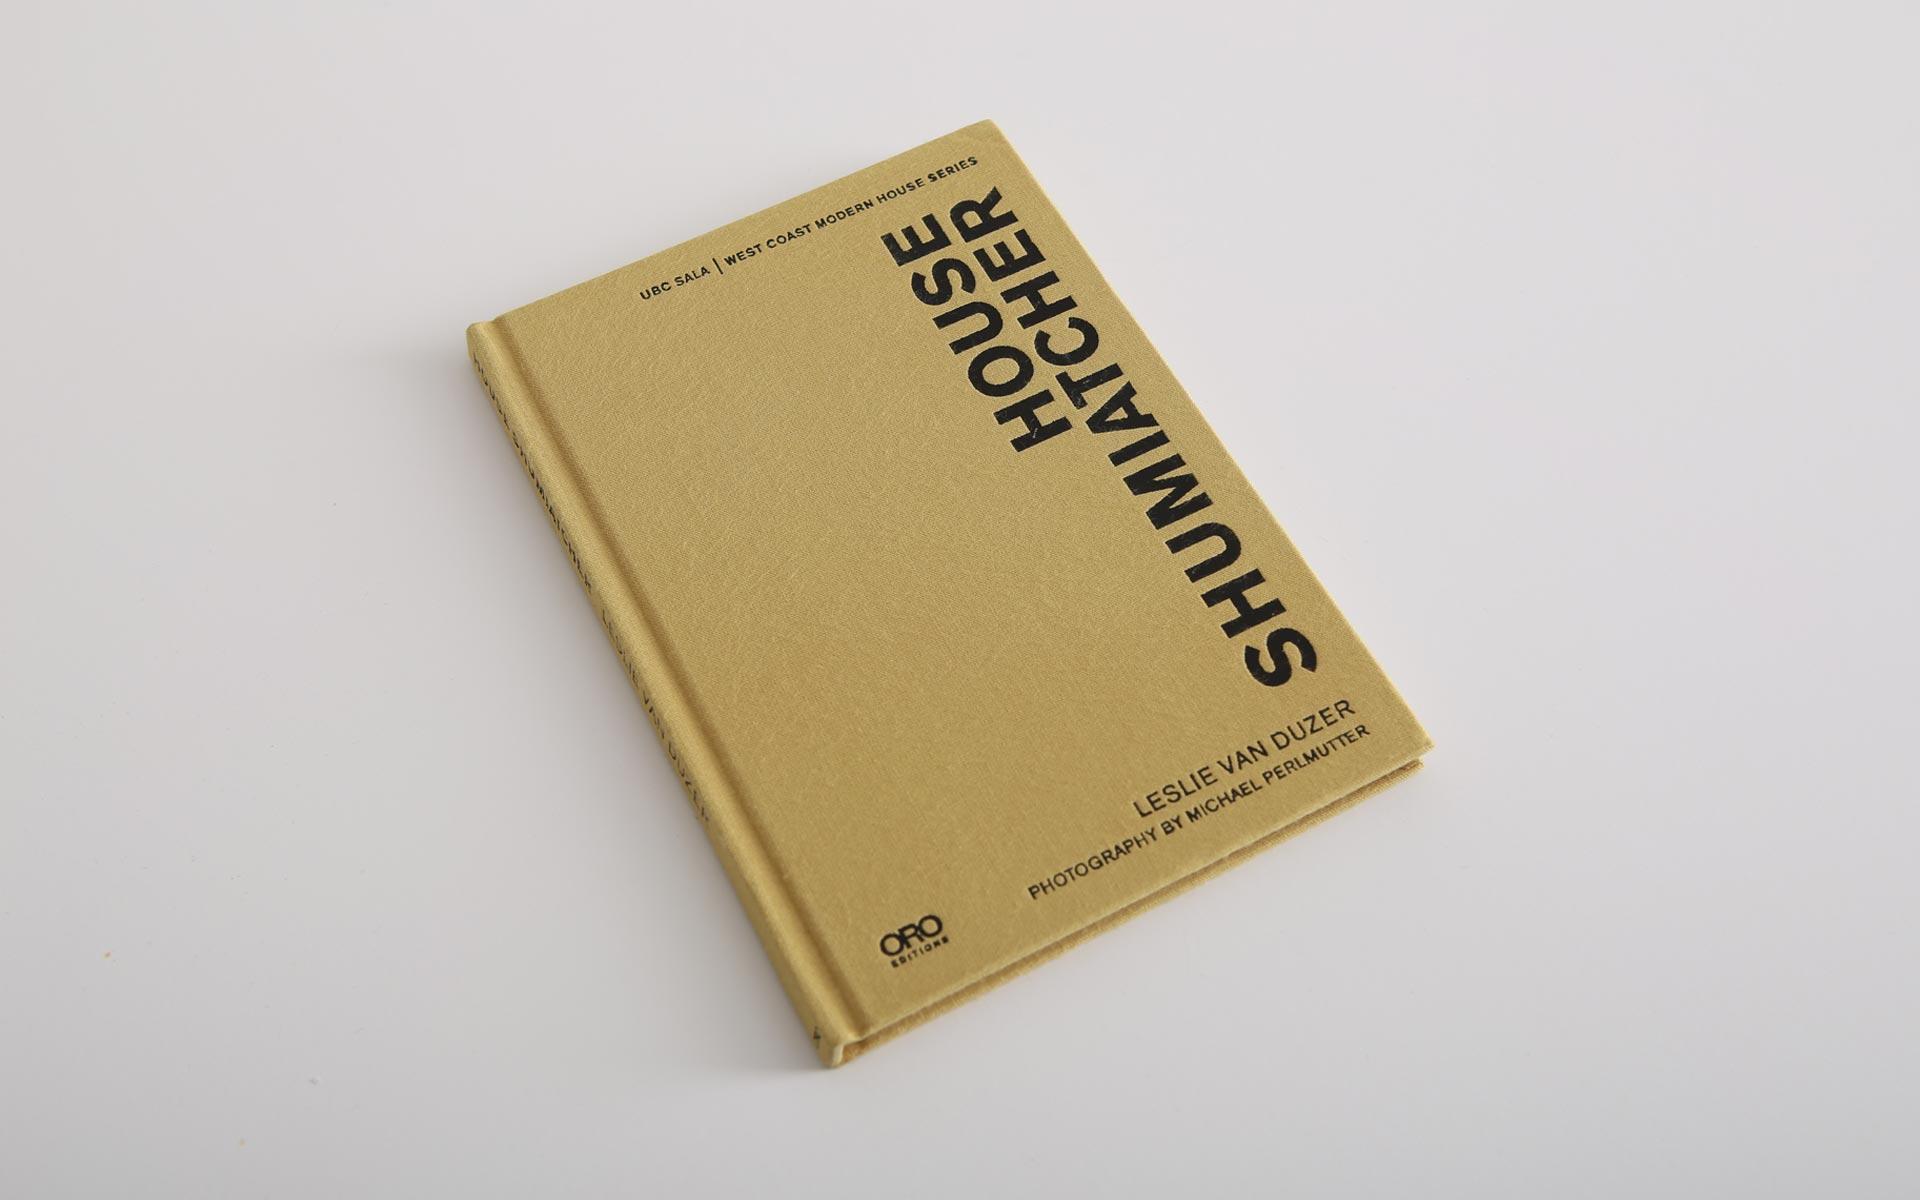 shumiatcher-ubc-sala-book-design-1